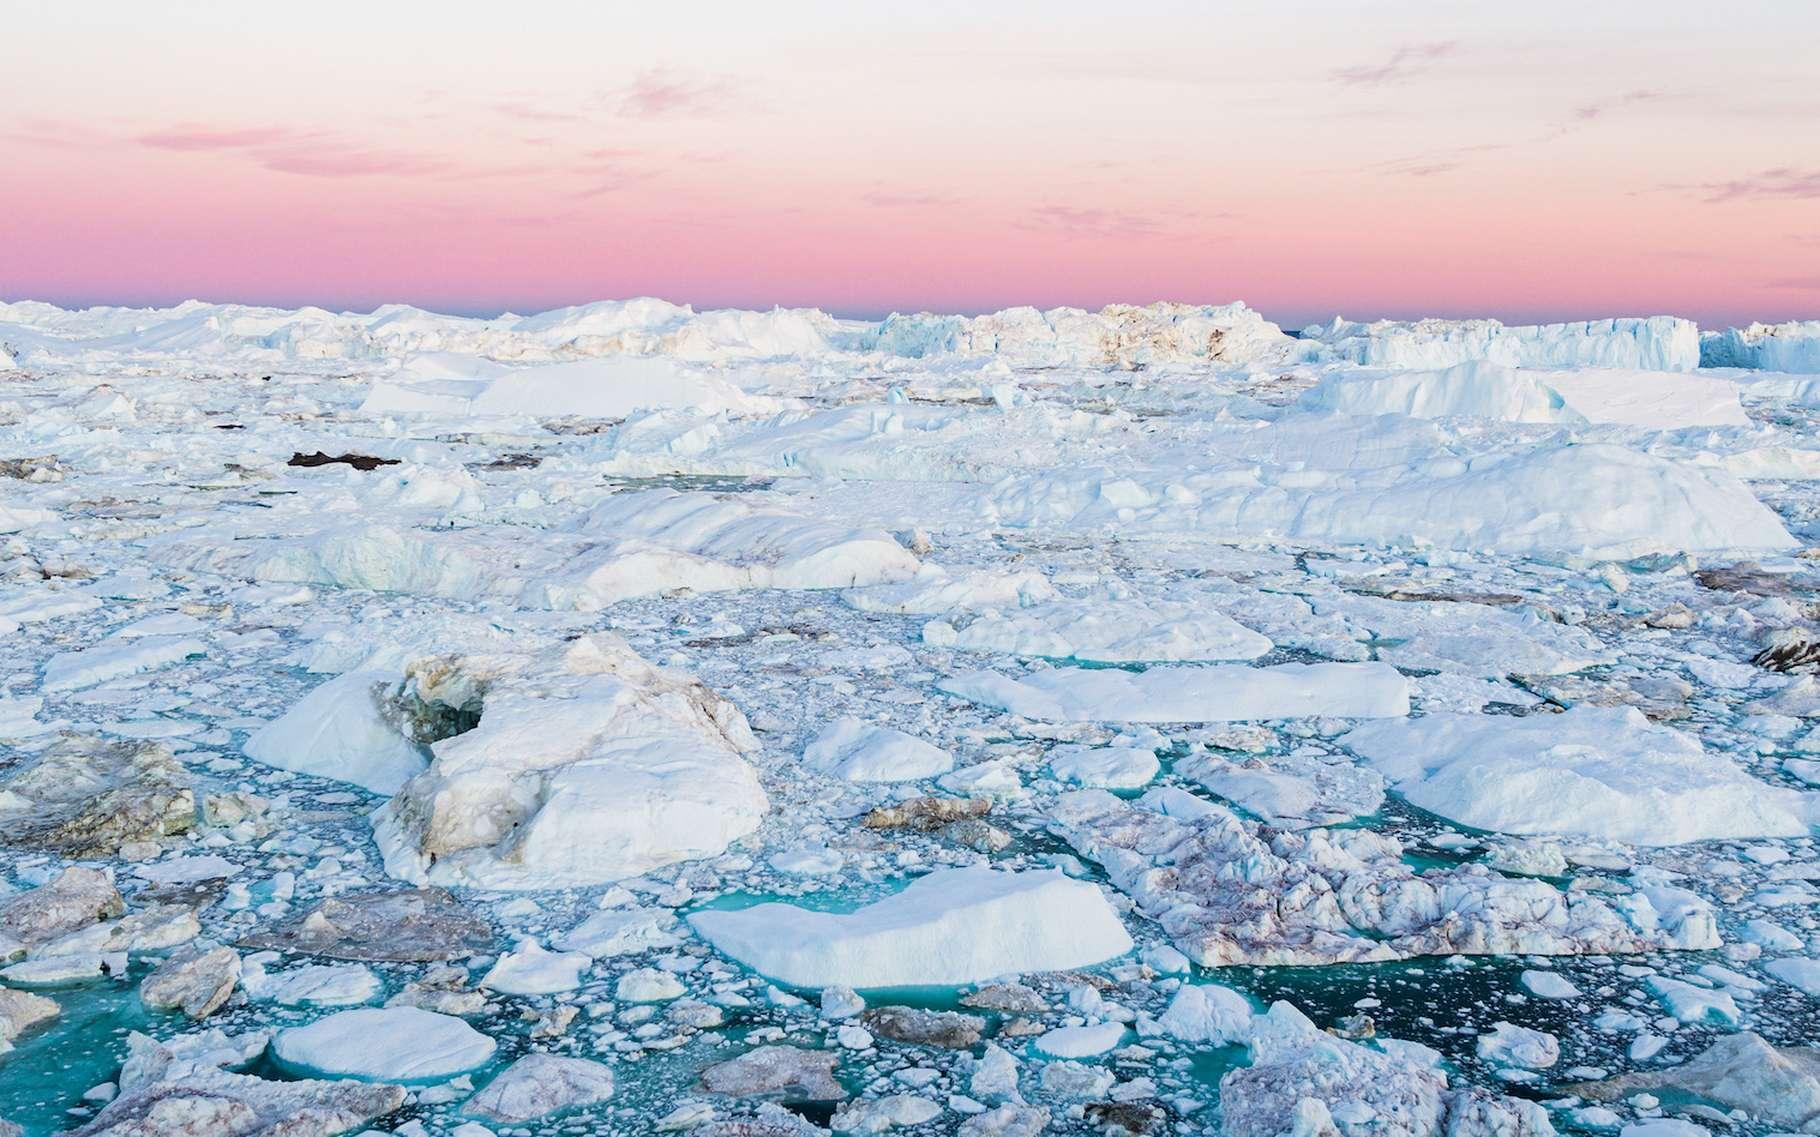 L'inlandsis du Groenland fond inexorablement. © Maridav, Adobe Stock